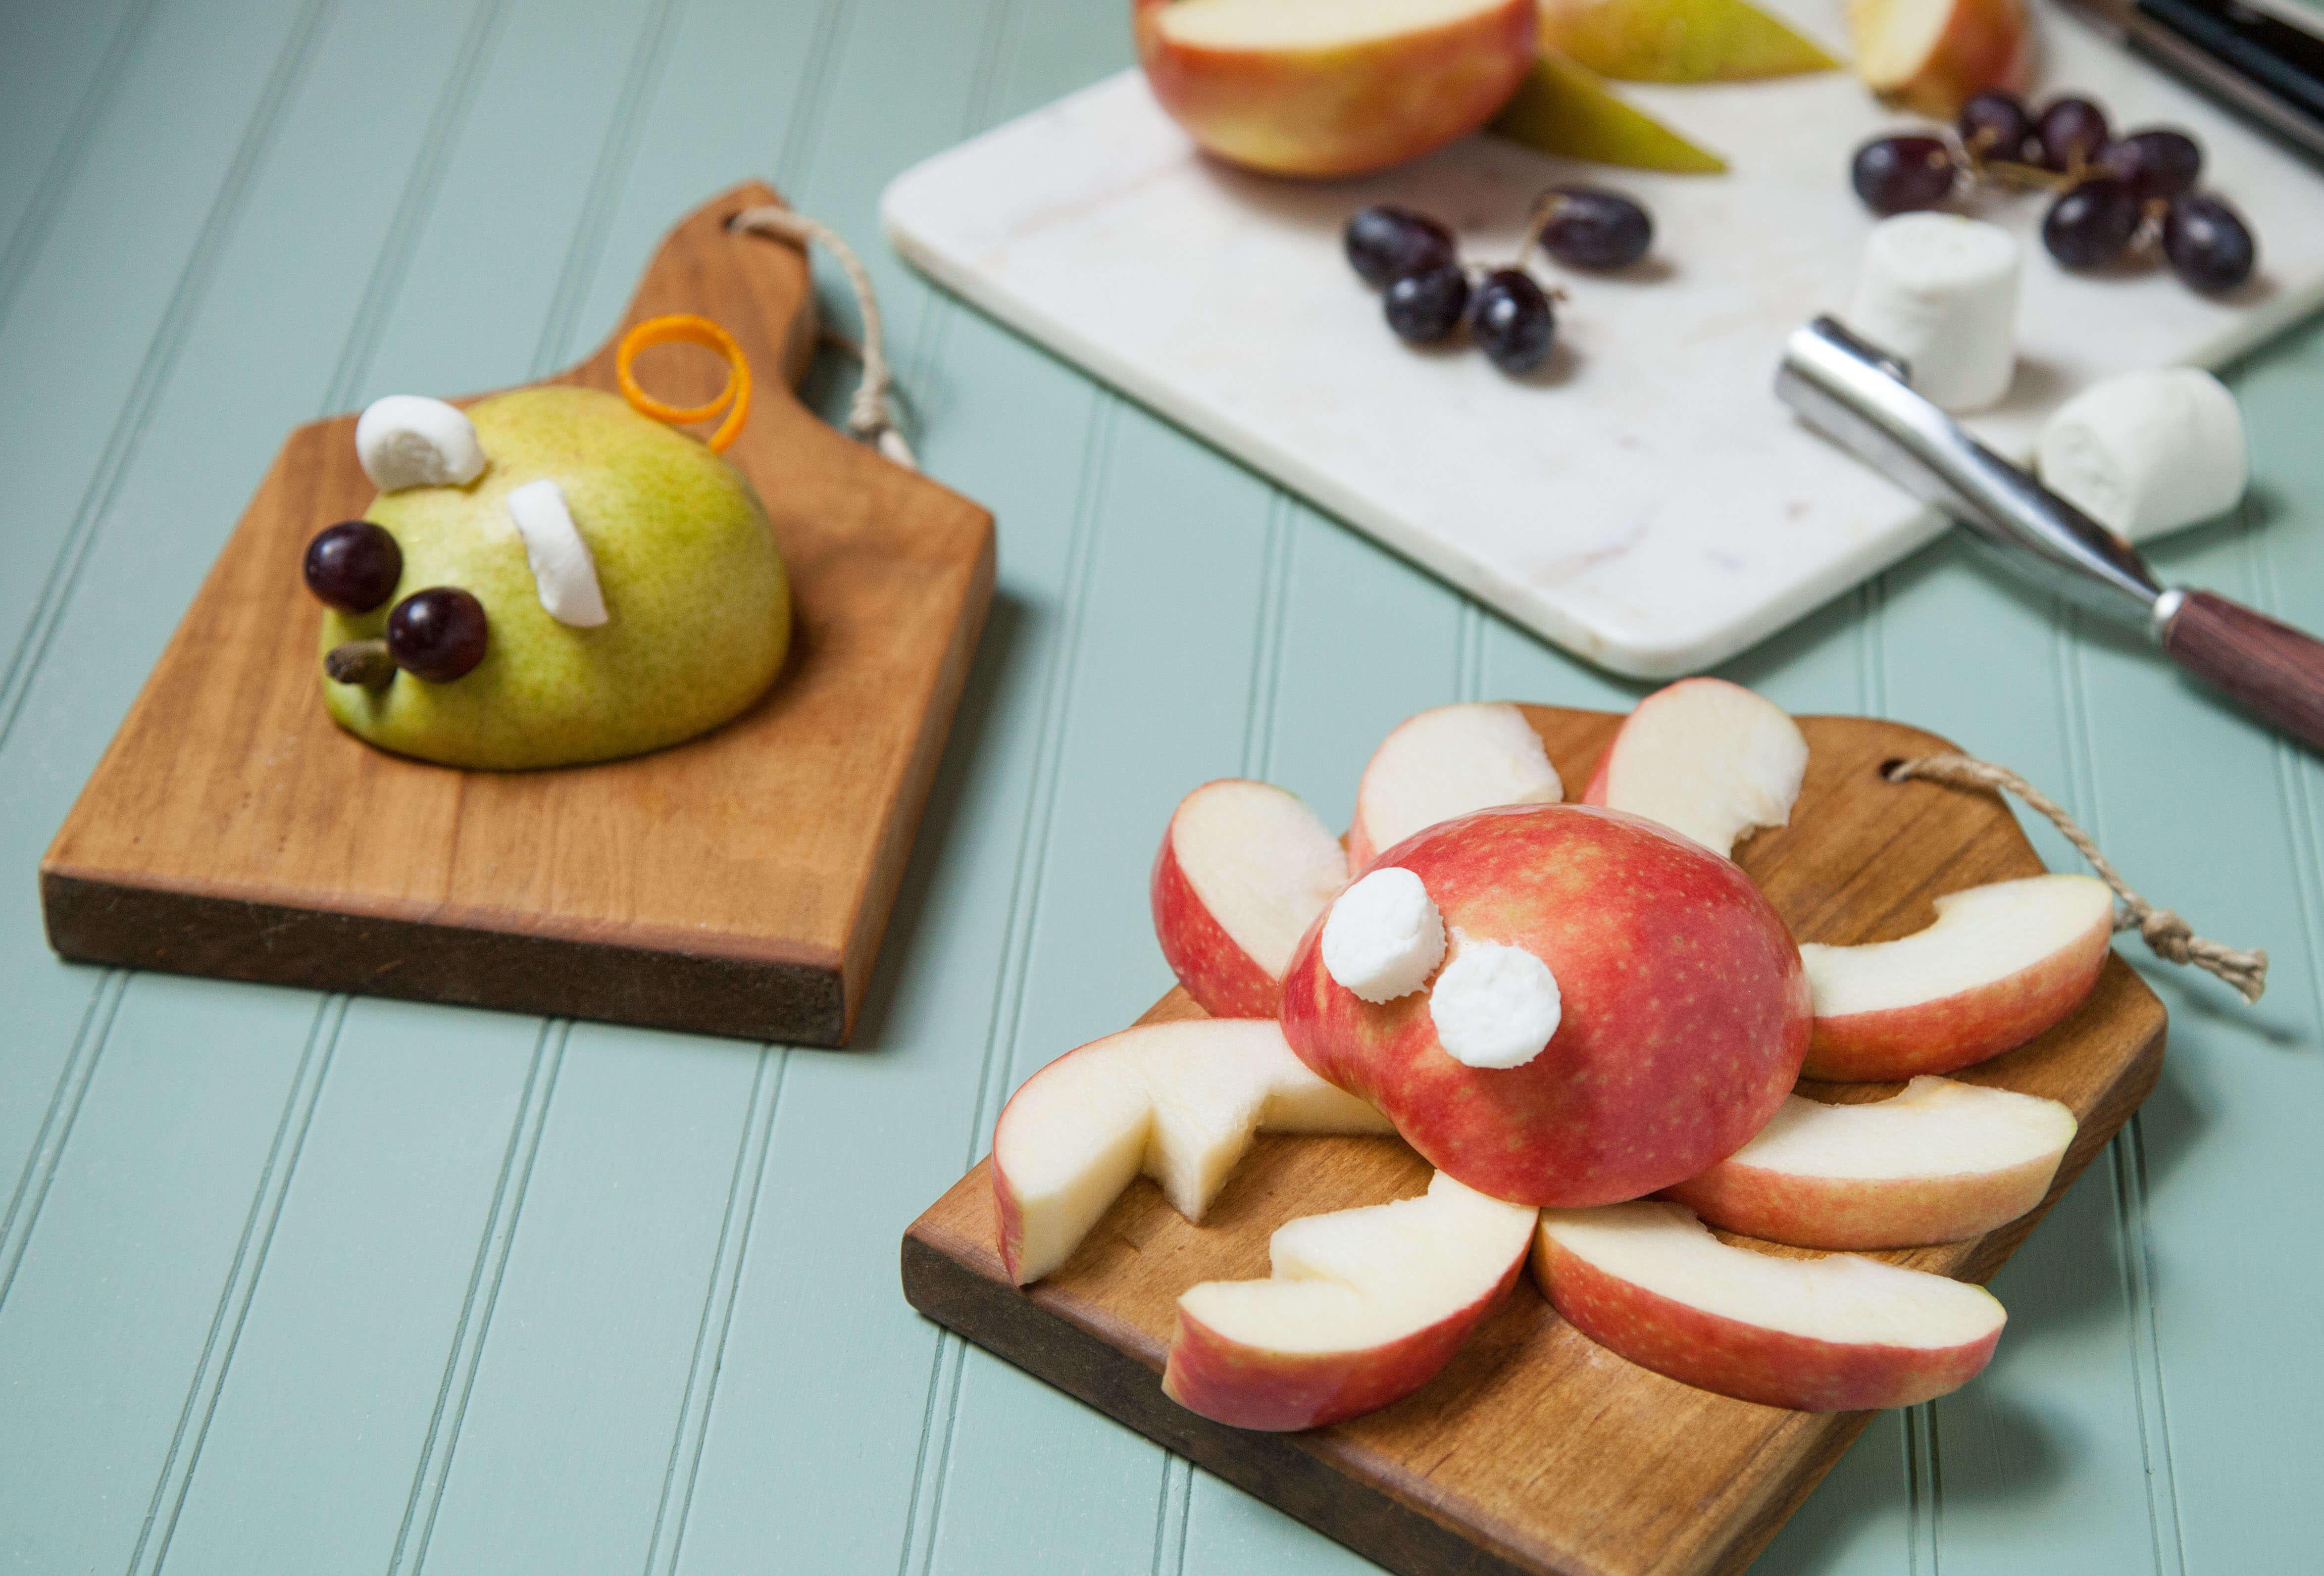 Creative Healthy Snacks  3 Creative & Healthy Kids Snack Ideas